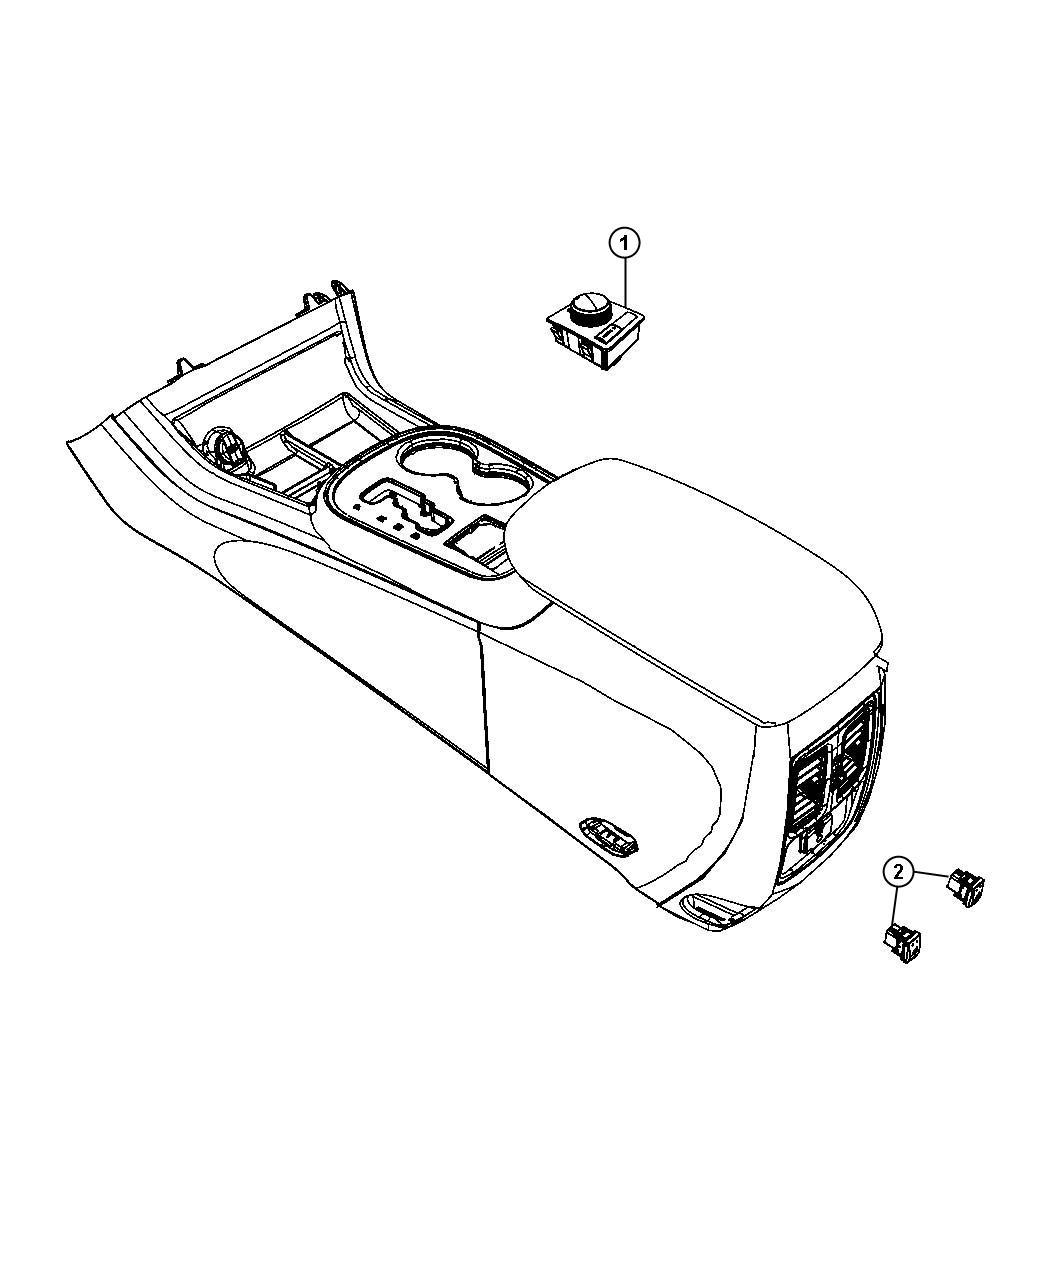 2012 Jeep Grand Cherokee Switch. Transfer case. [quadra